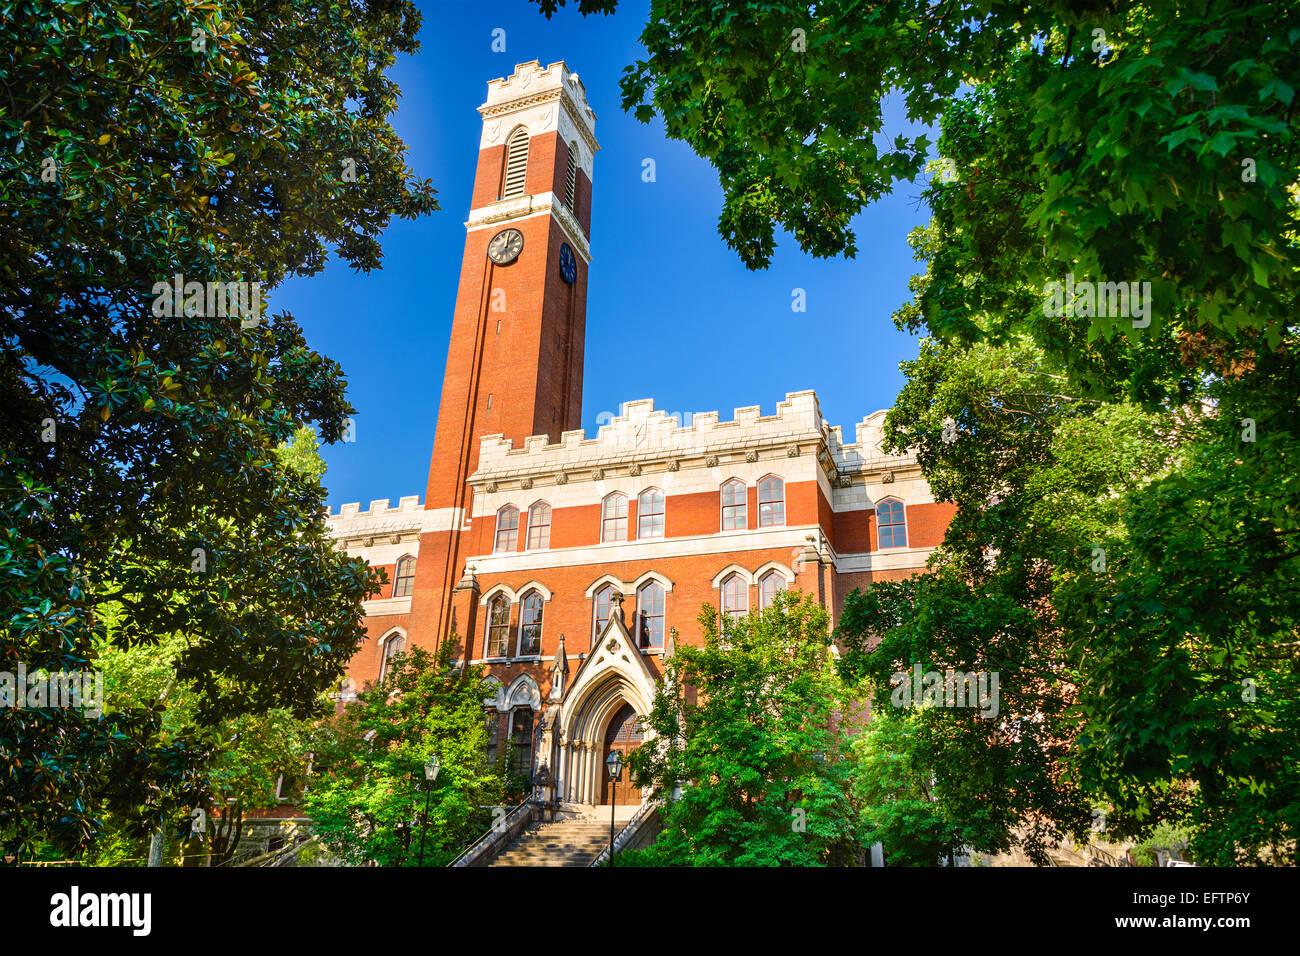 Campus of Vanderbilt University in Nashville, Tennessee. - Stock Image